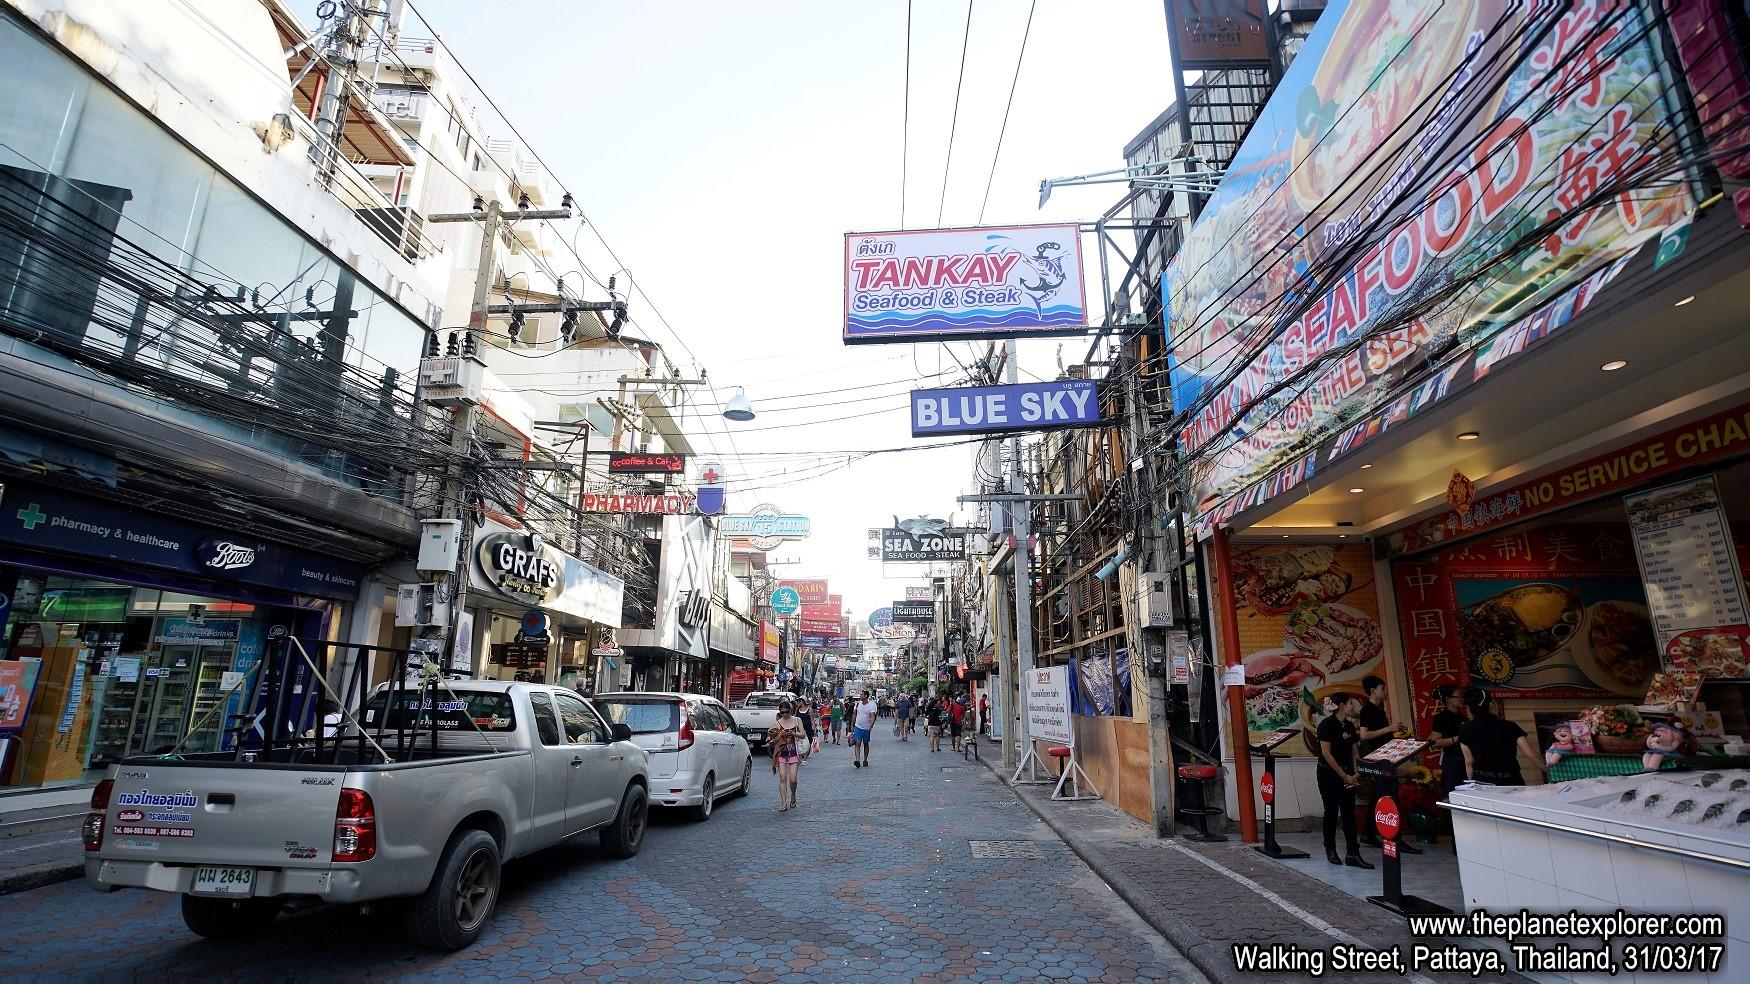 2017-03-31_1744_Thailand_Pattaya_Walking Street_DSC03983_s7R2_LR_@